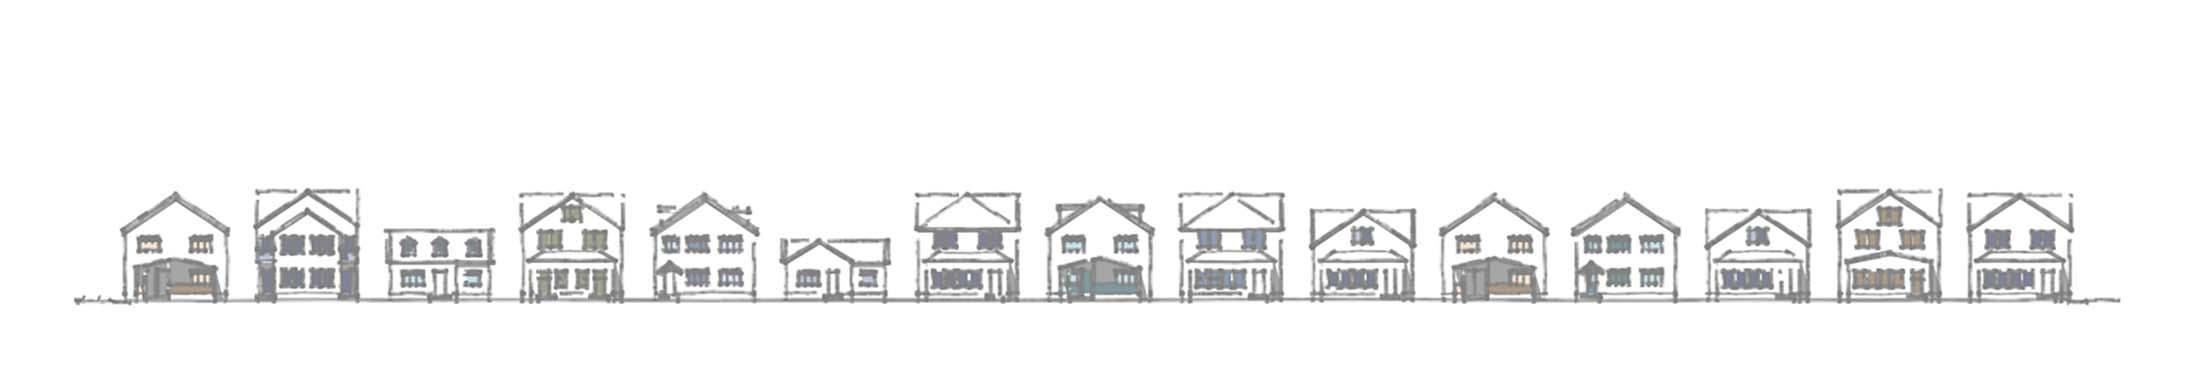 Elevation rendering of Interior 1